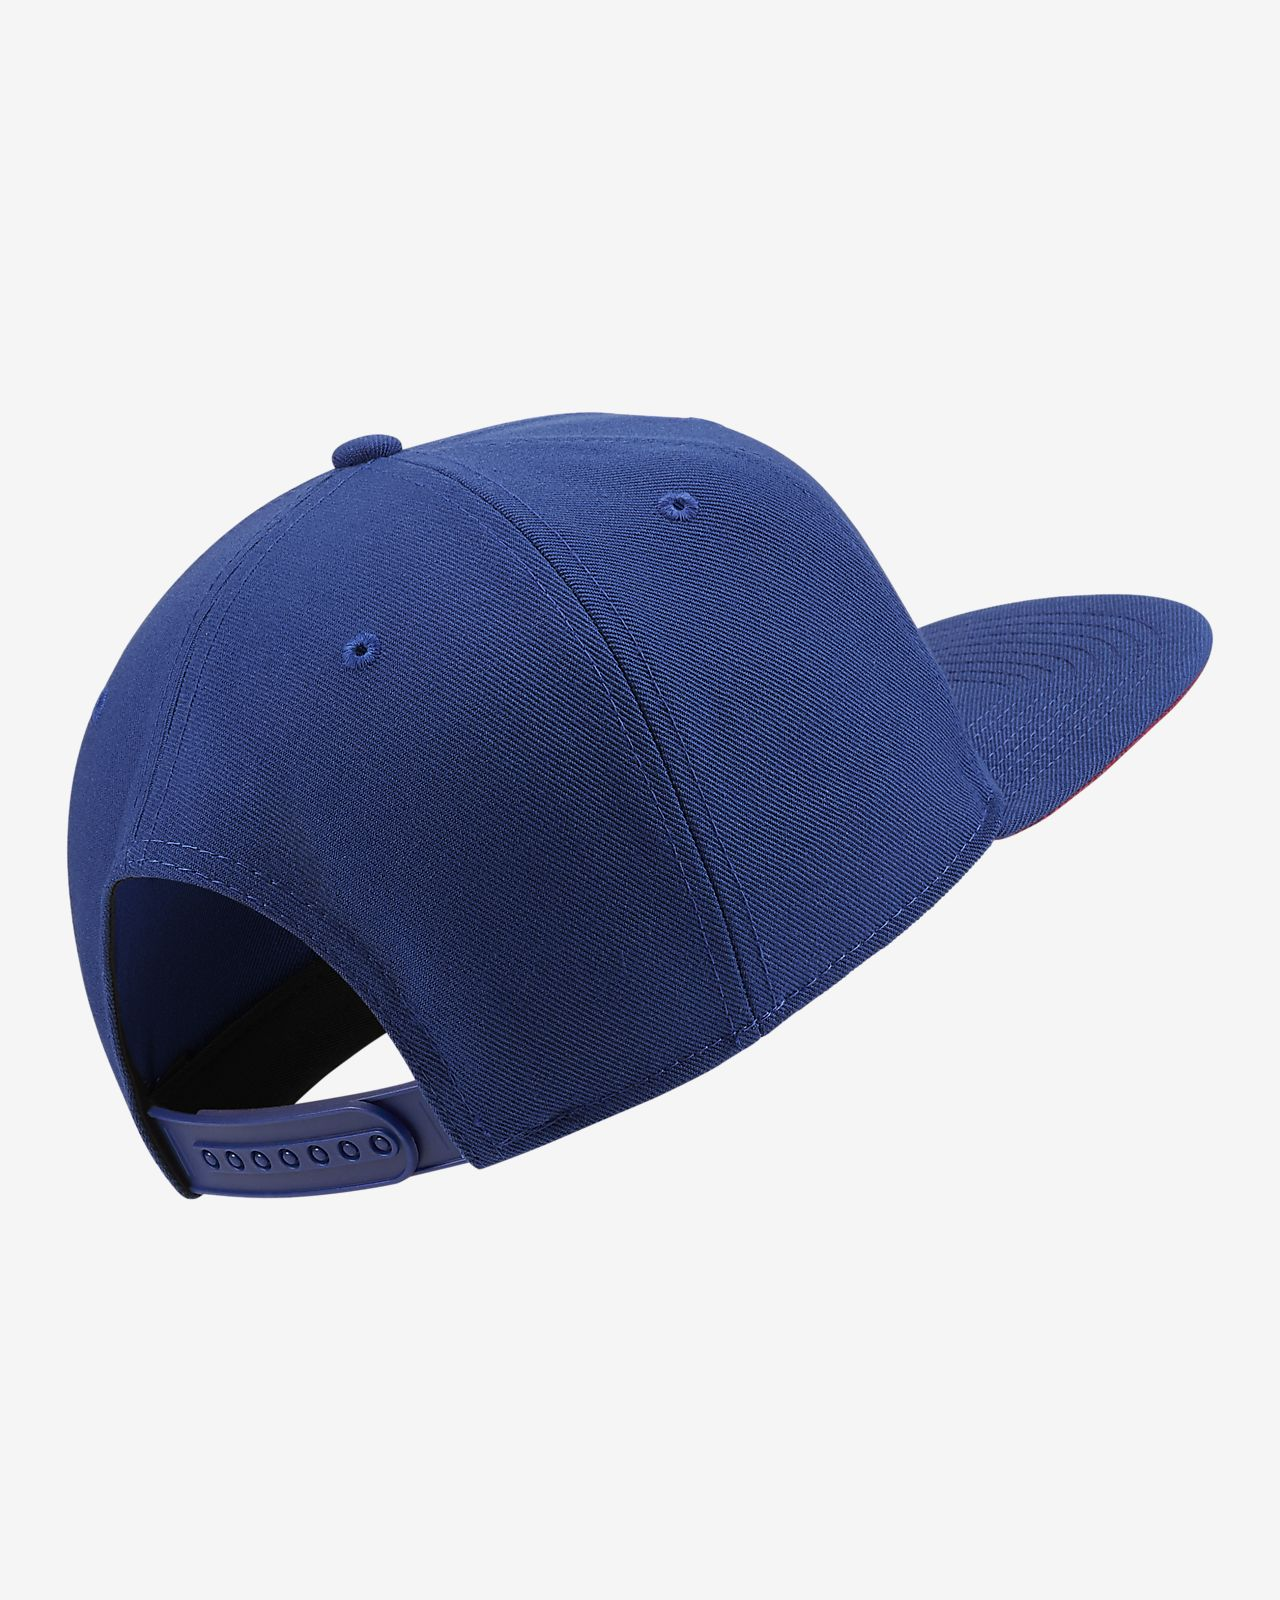 6e92255acac91a Nike Pro FC Barcelona Adjustable Hat. Nike.com GB